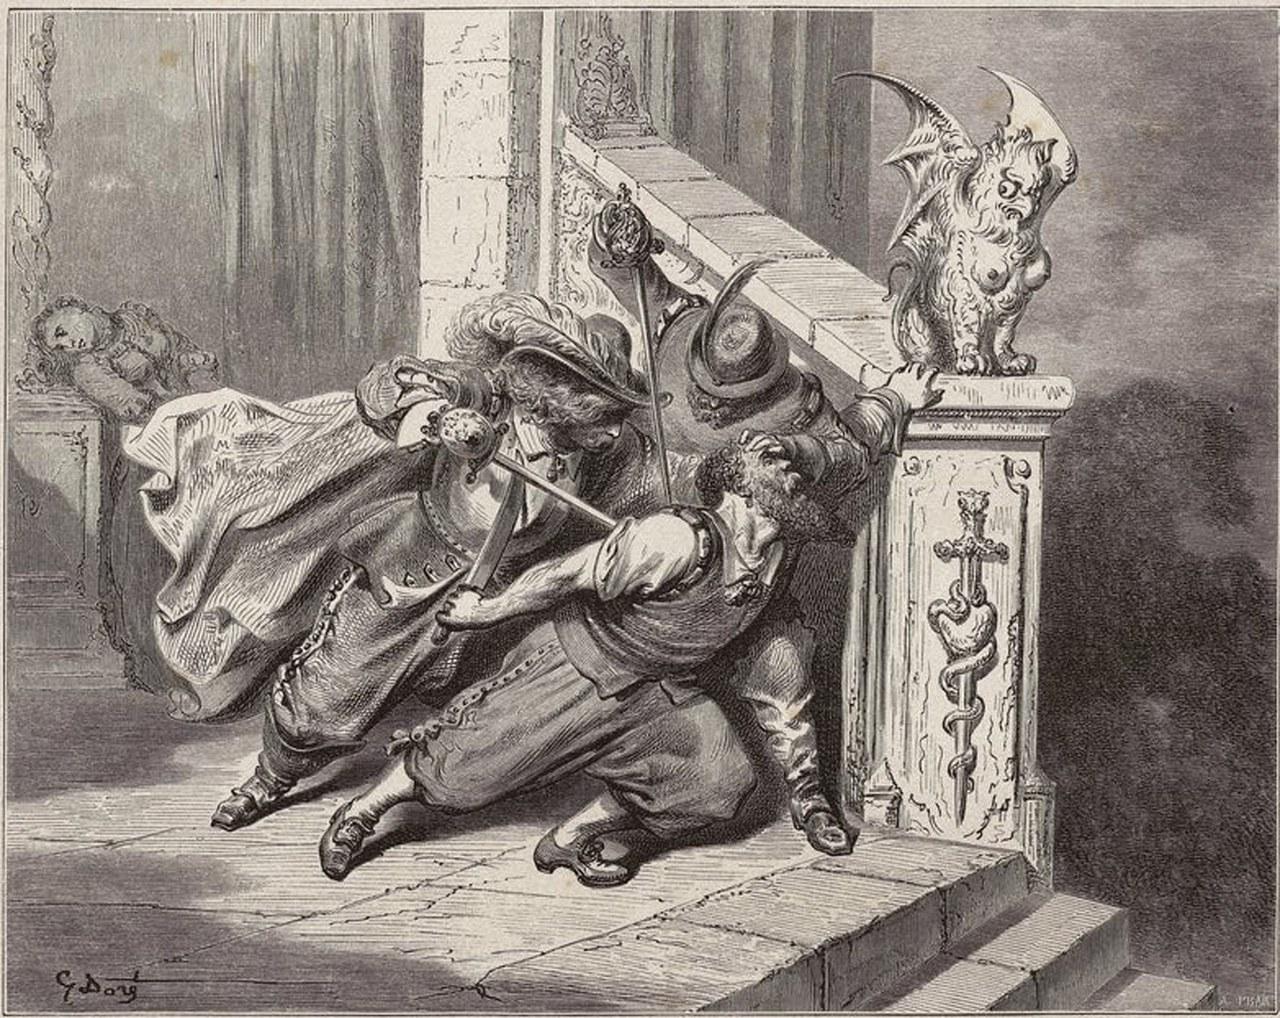 Fig. 4 Gustave Doré, La mort de Barbe Bleue, 1862.